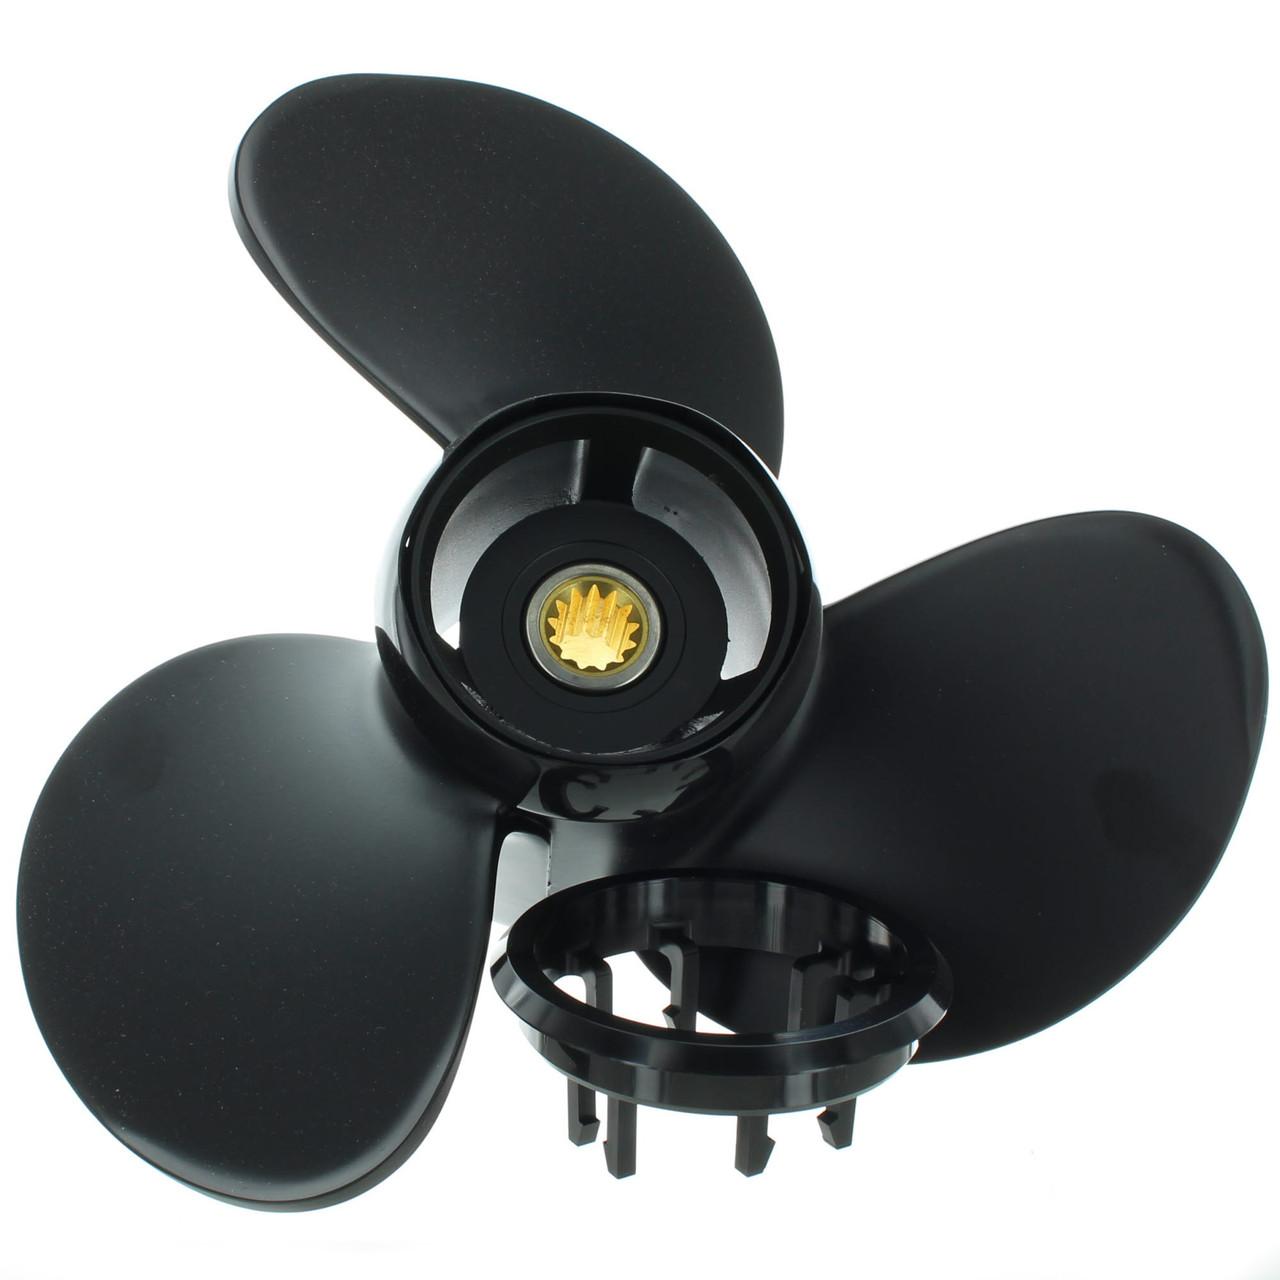 Evinrude Johnson New OEM Hydrus Propeller Pontoon Prop 13 875x13 177203  13-7/8